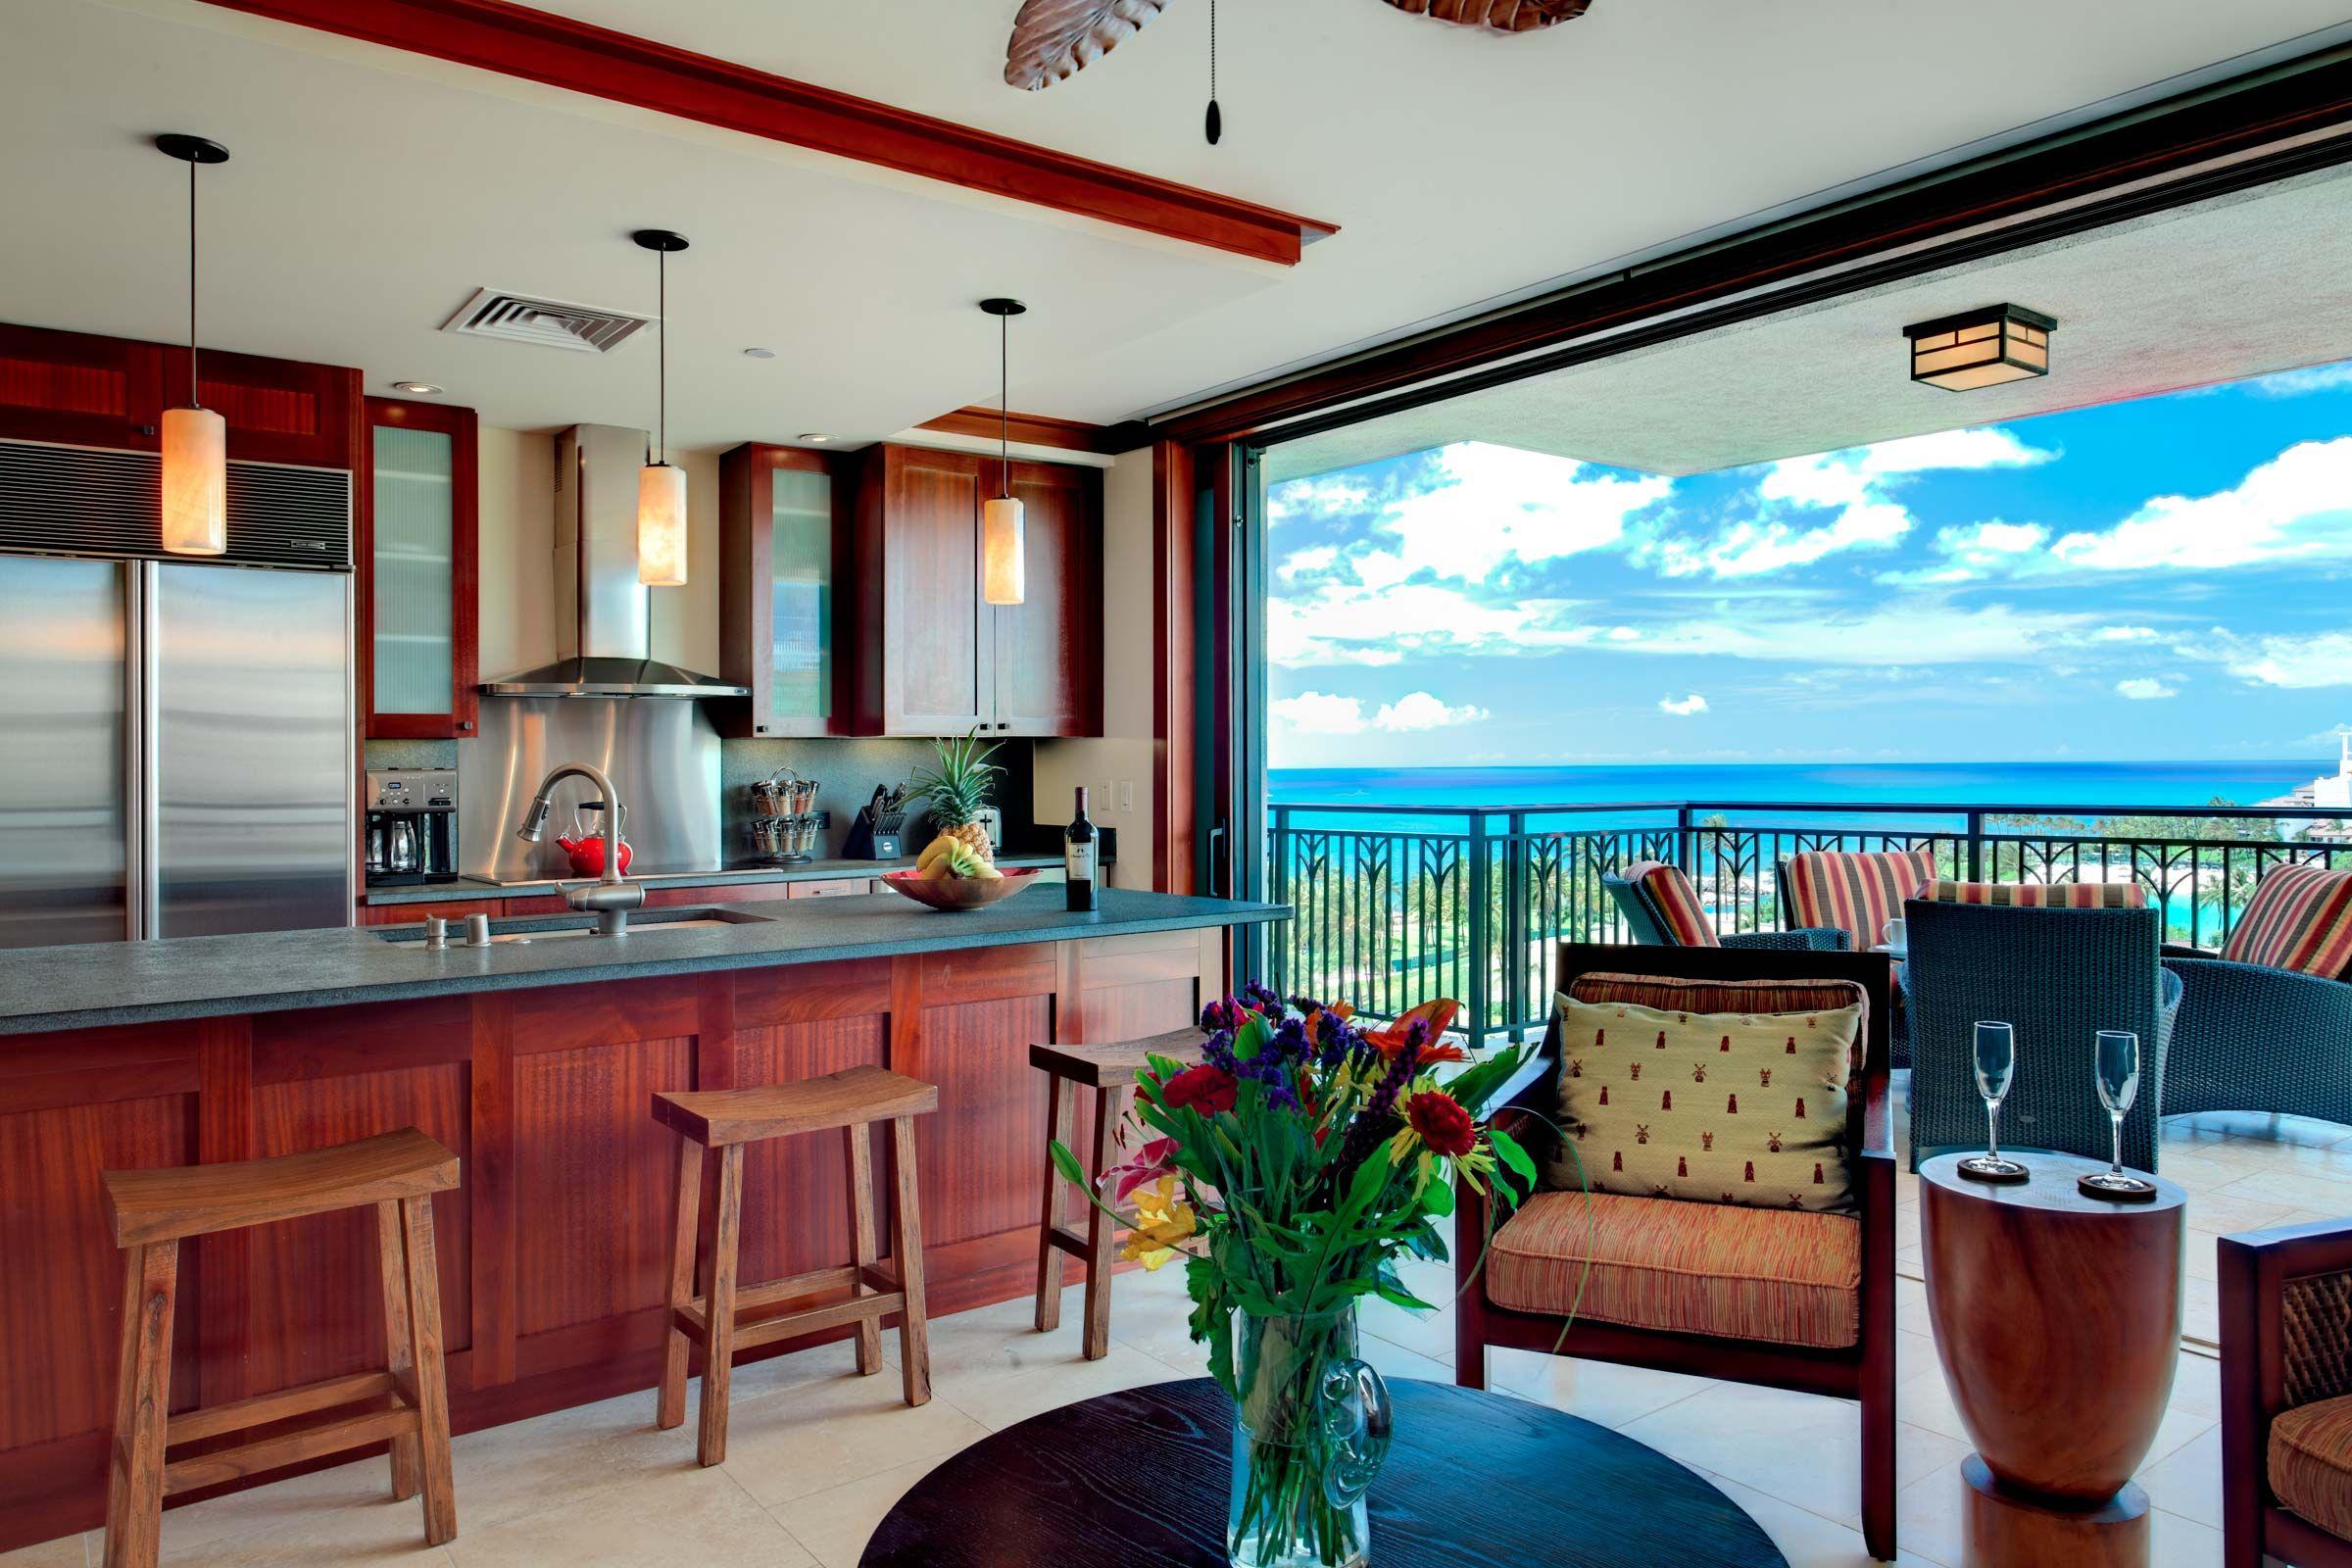 Aulani 2 bedroom villa pictures   design ideas 2017-2018 ...